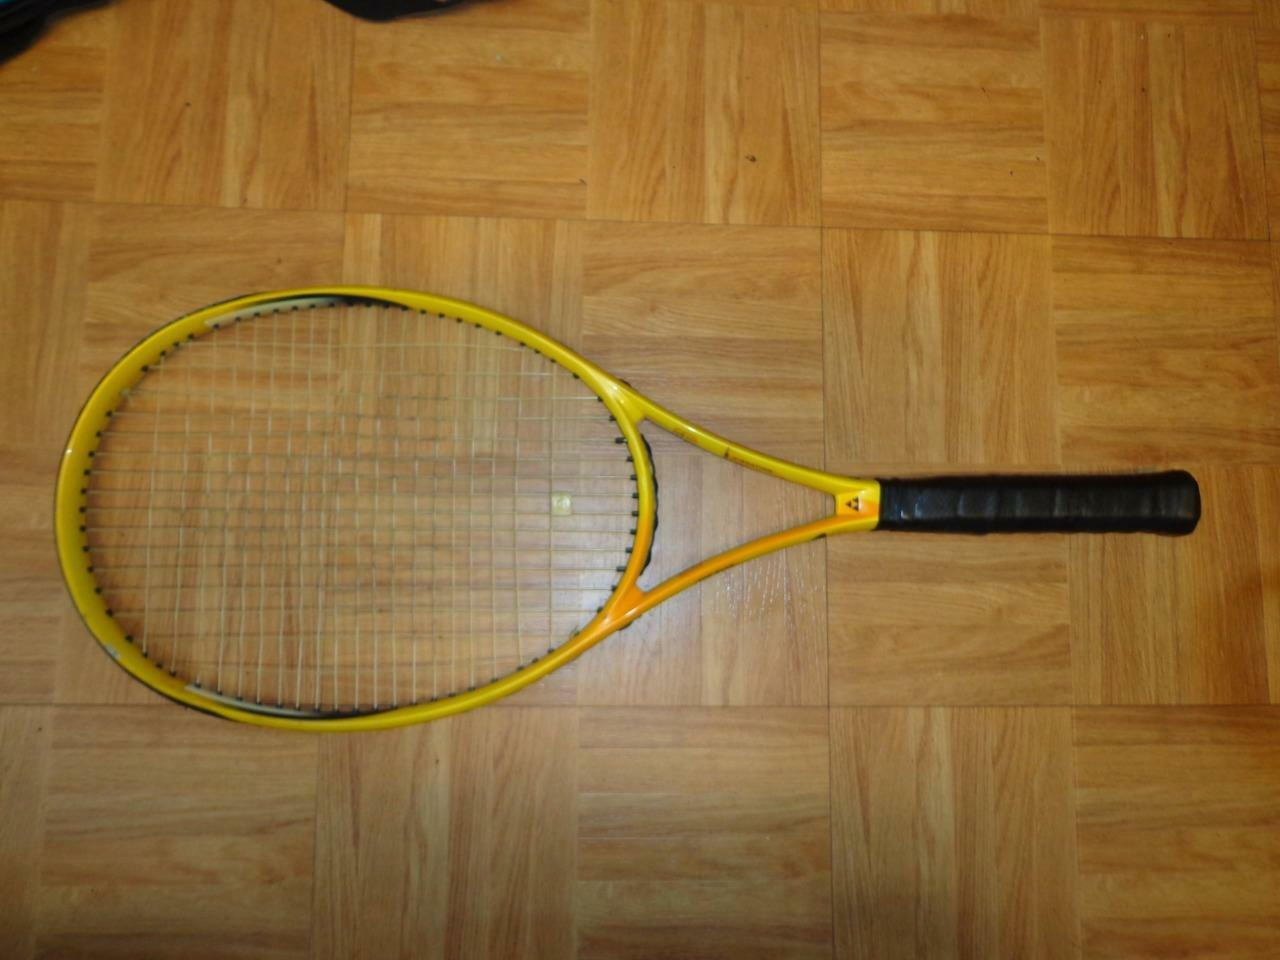 Fischer elíptica Midplus 98 4 3 8 Grip Tenis Raqueta